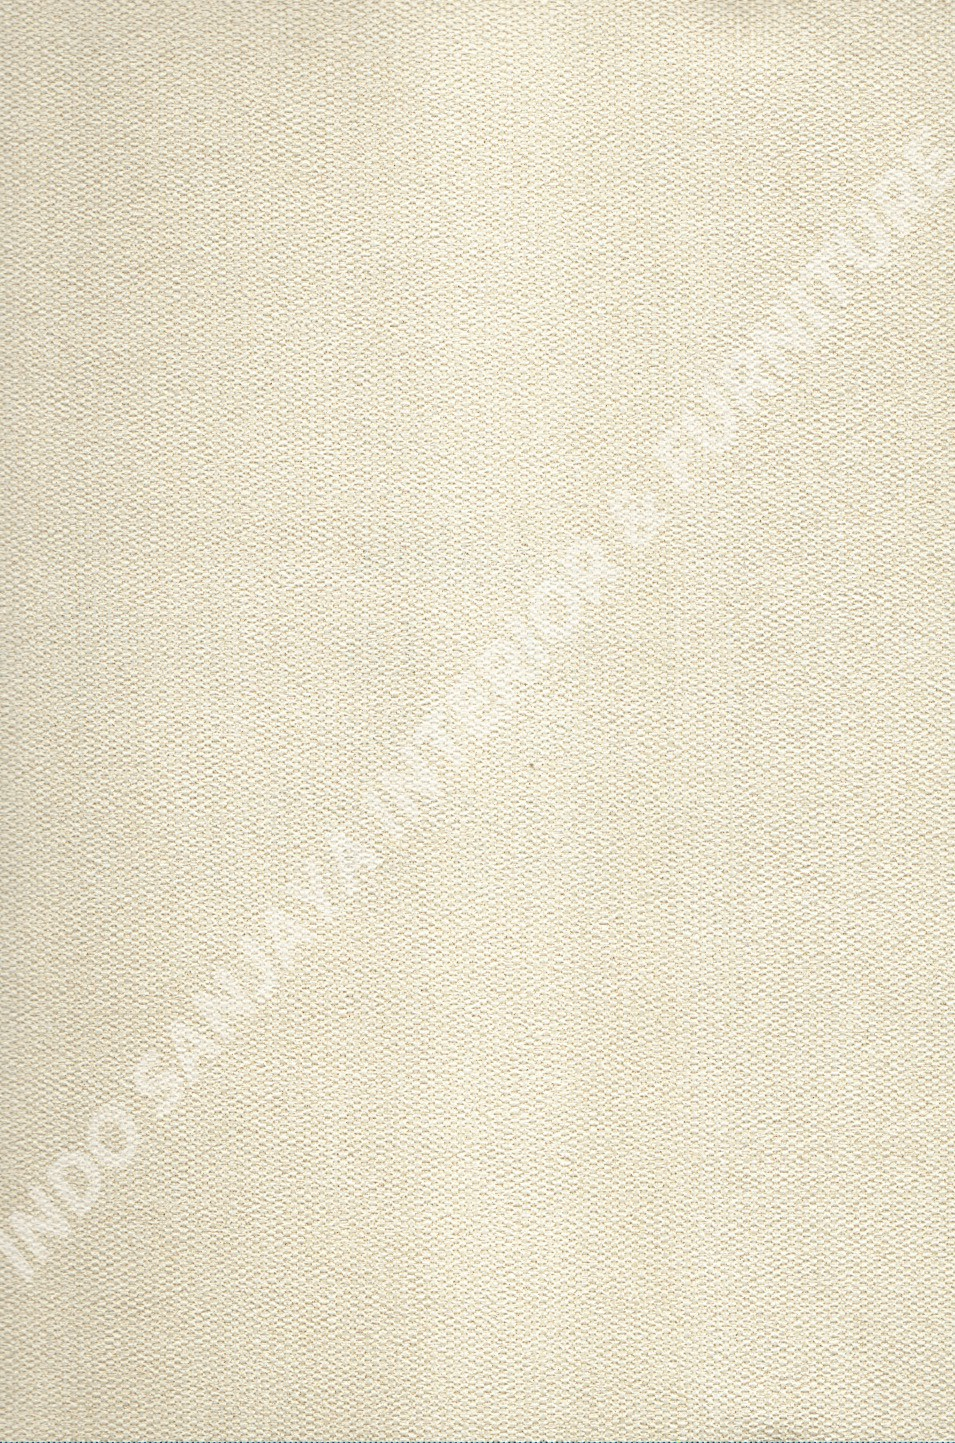 wallpaper   Wallpaper Minimalis Polos 87032:87032 corak  warna